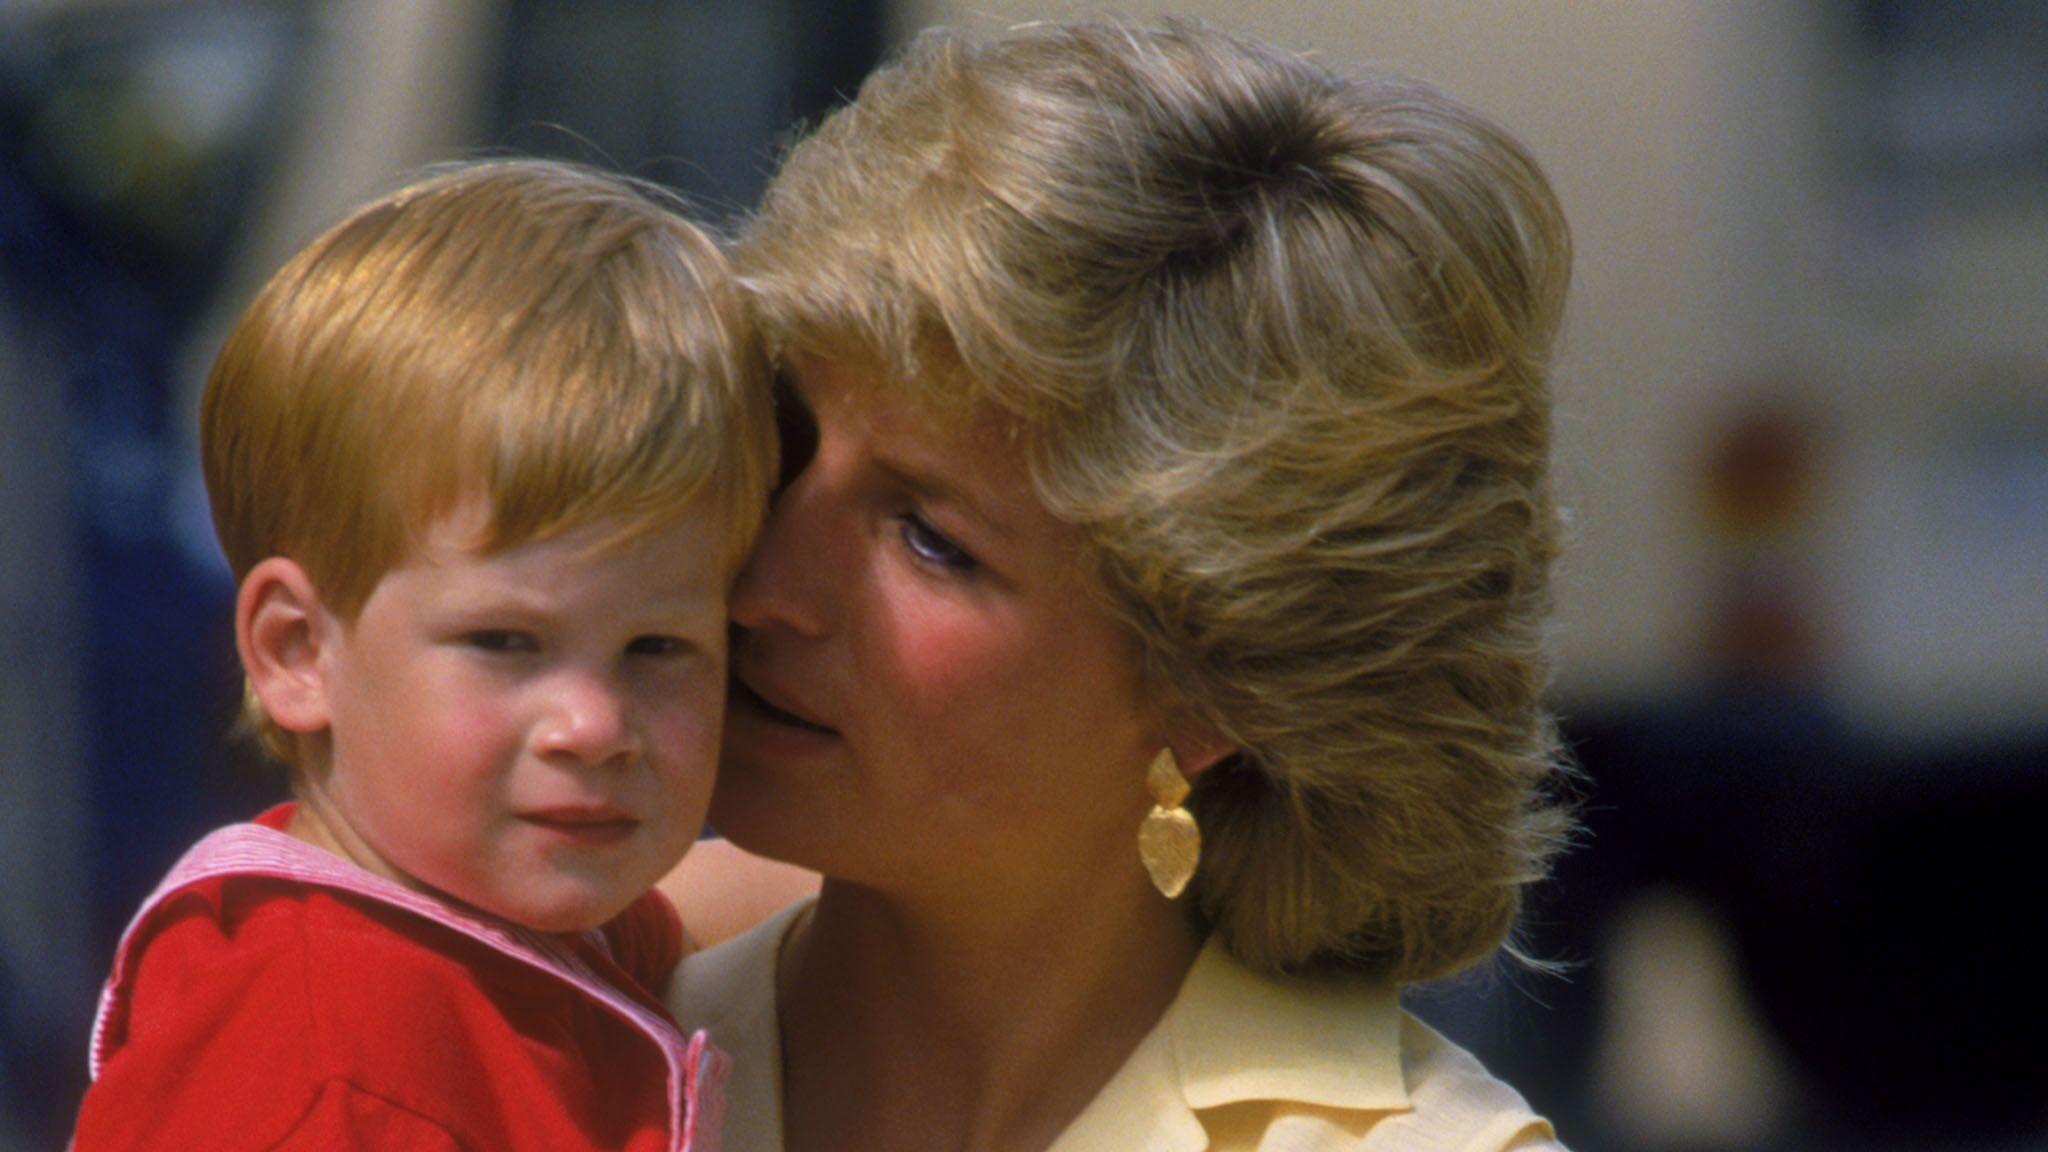 Diana Prince grosse bite noire